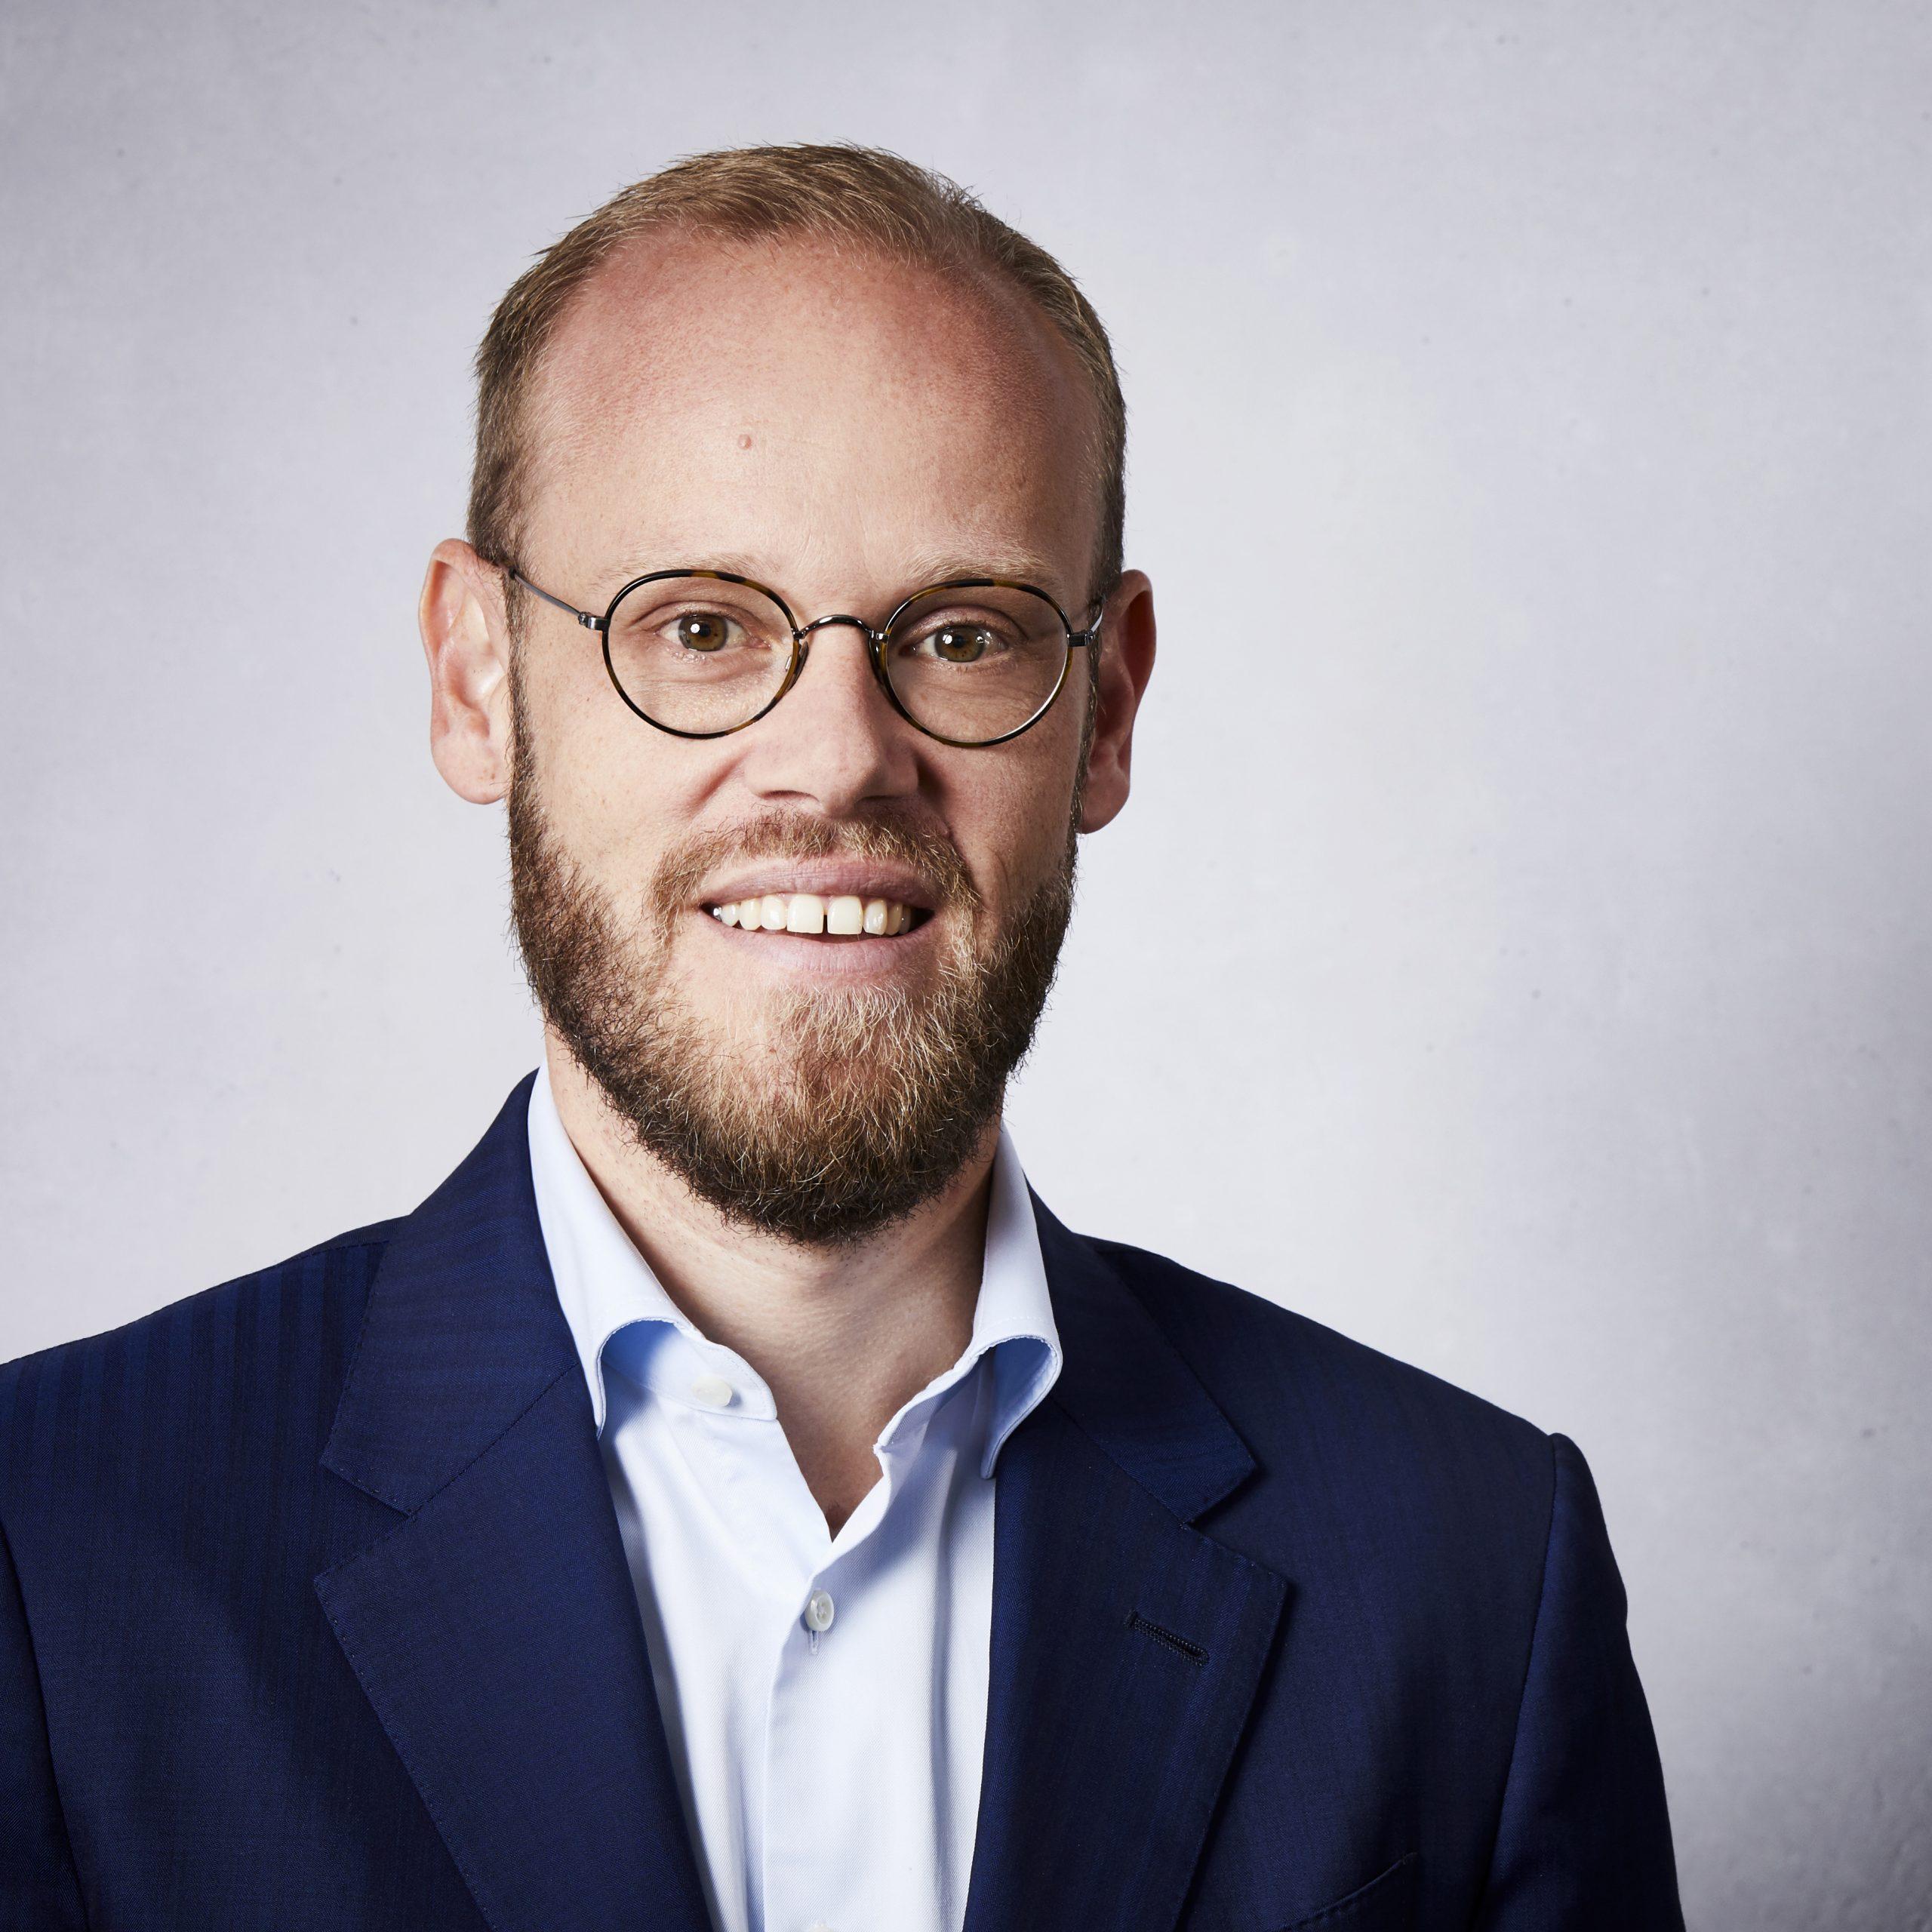 Sven Sontowski